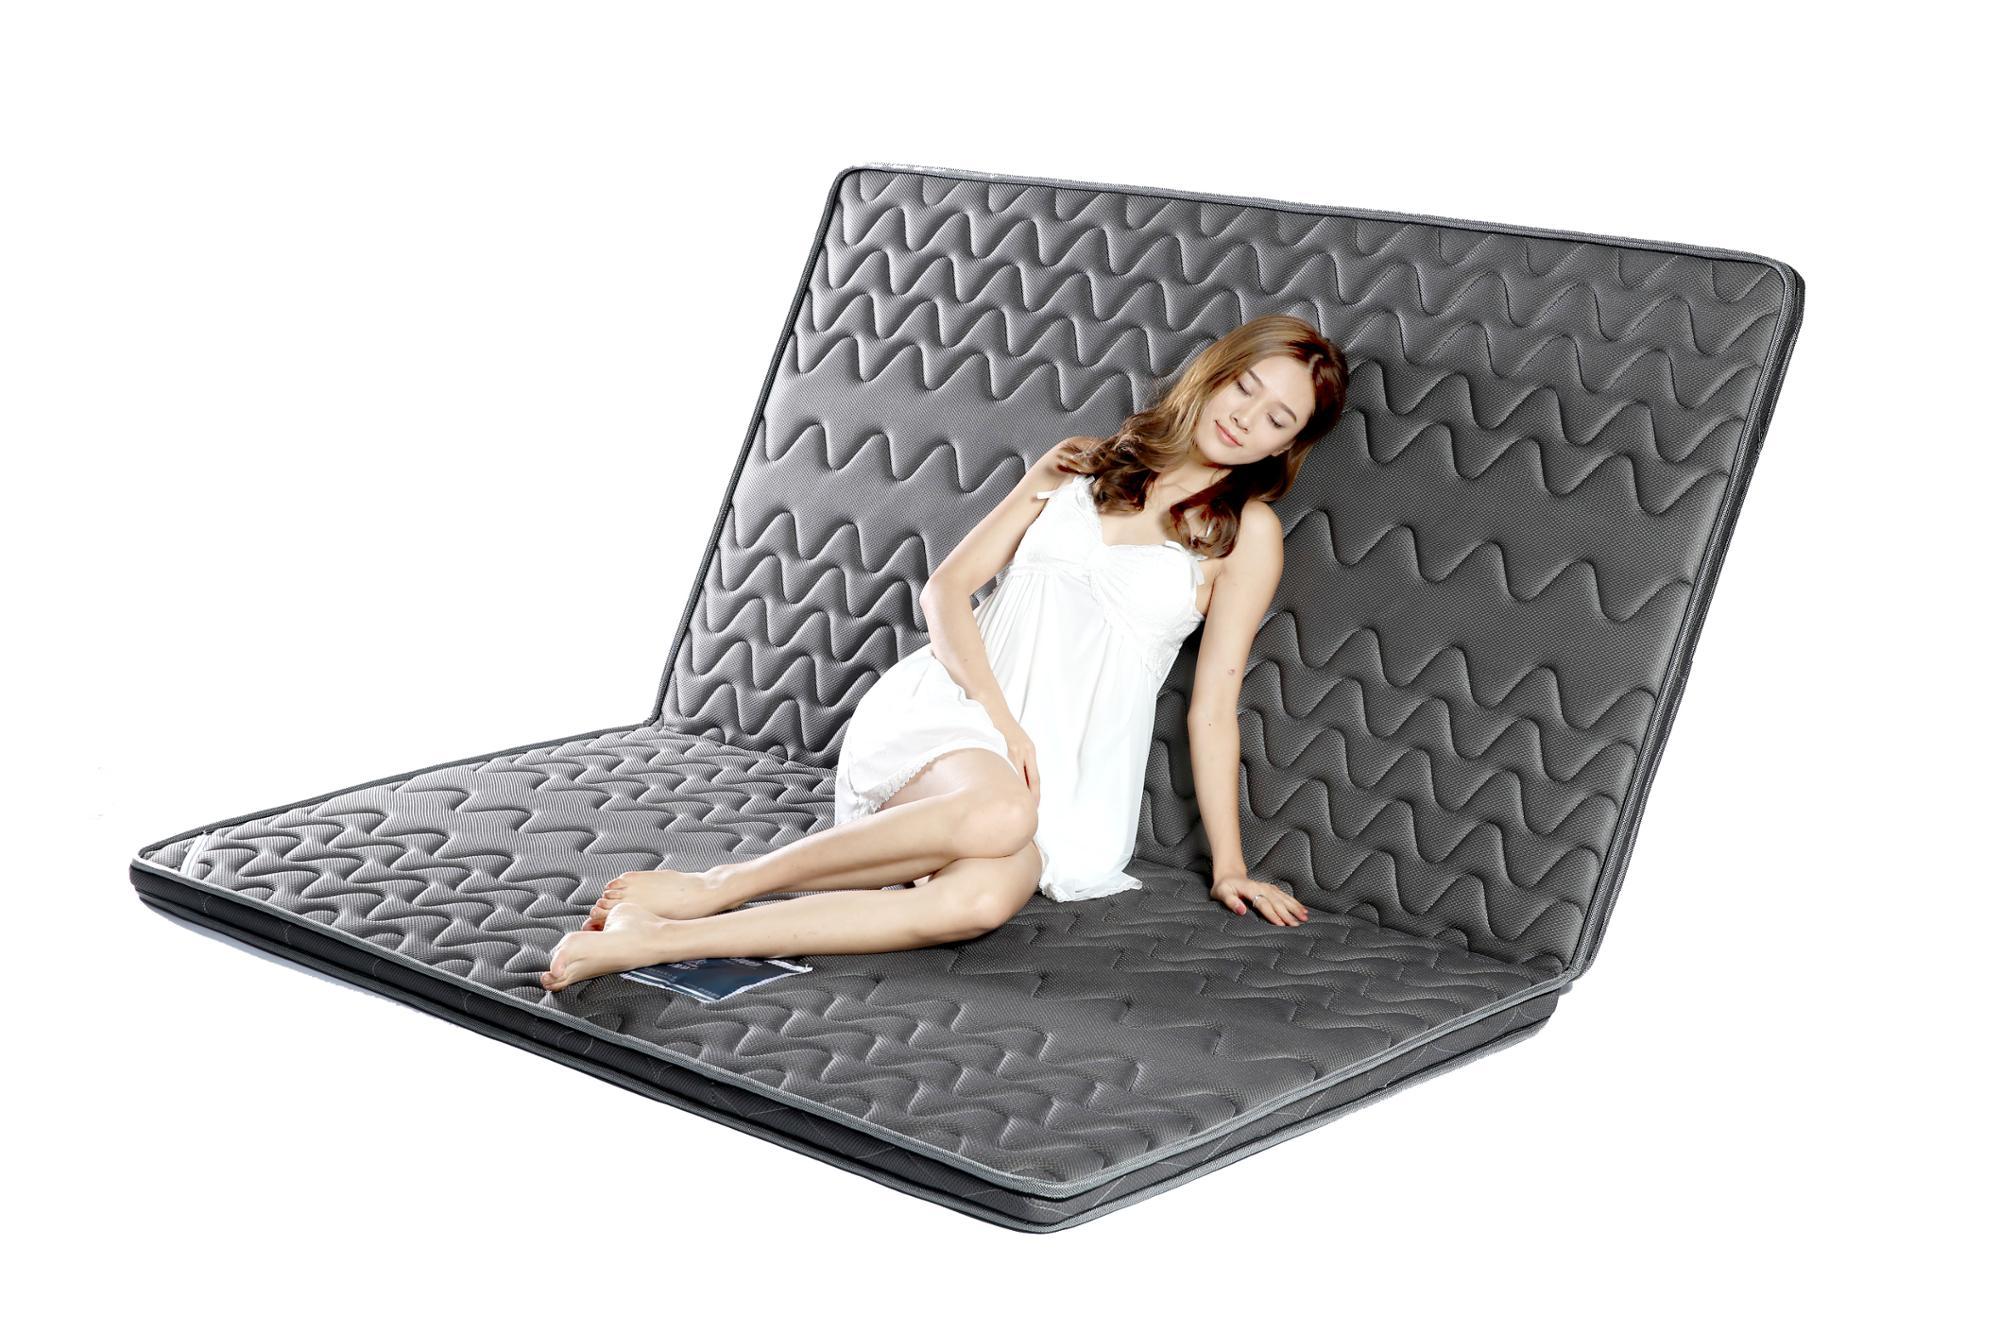 Cheap foldable waterproof natural coconut palm coir bed mattress - Jozy Mattress | Jozy.net